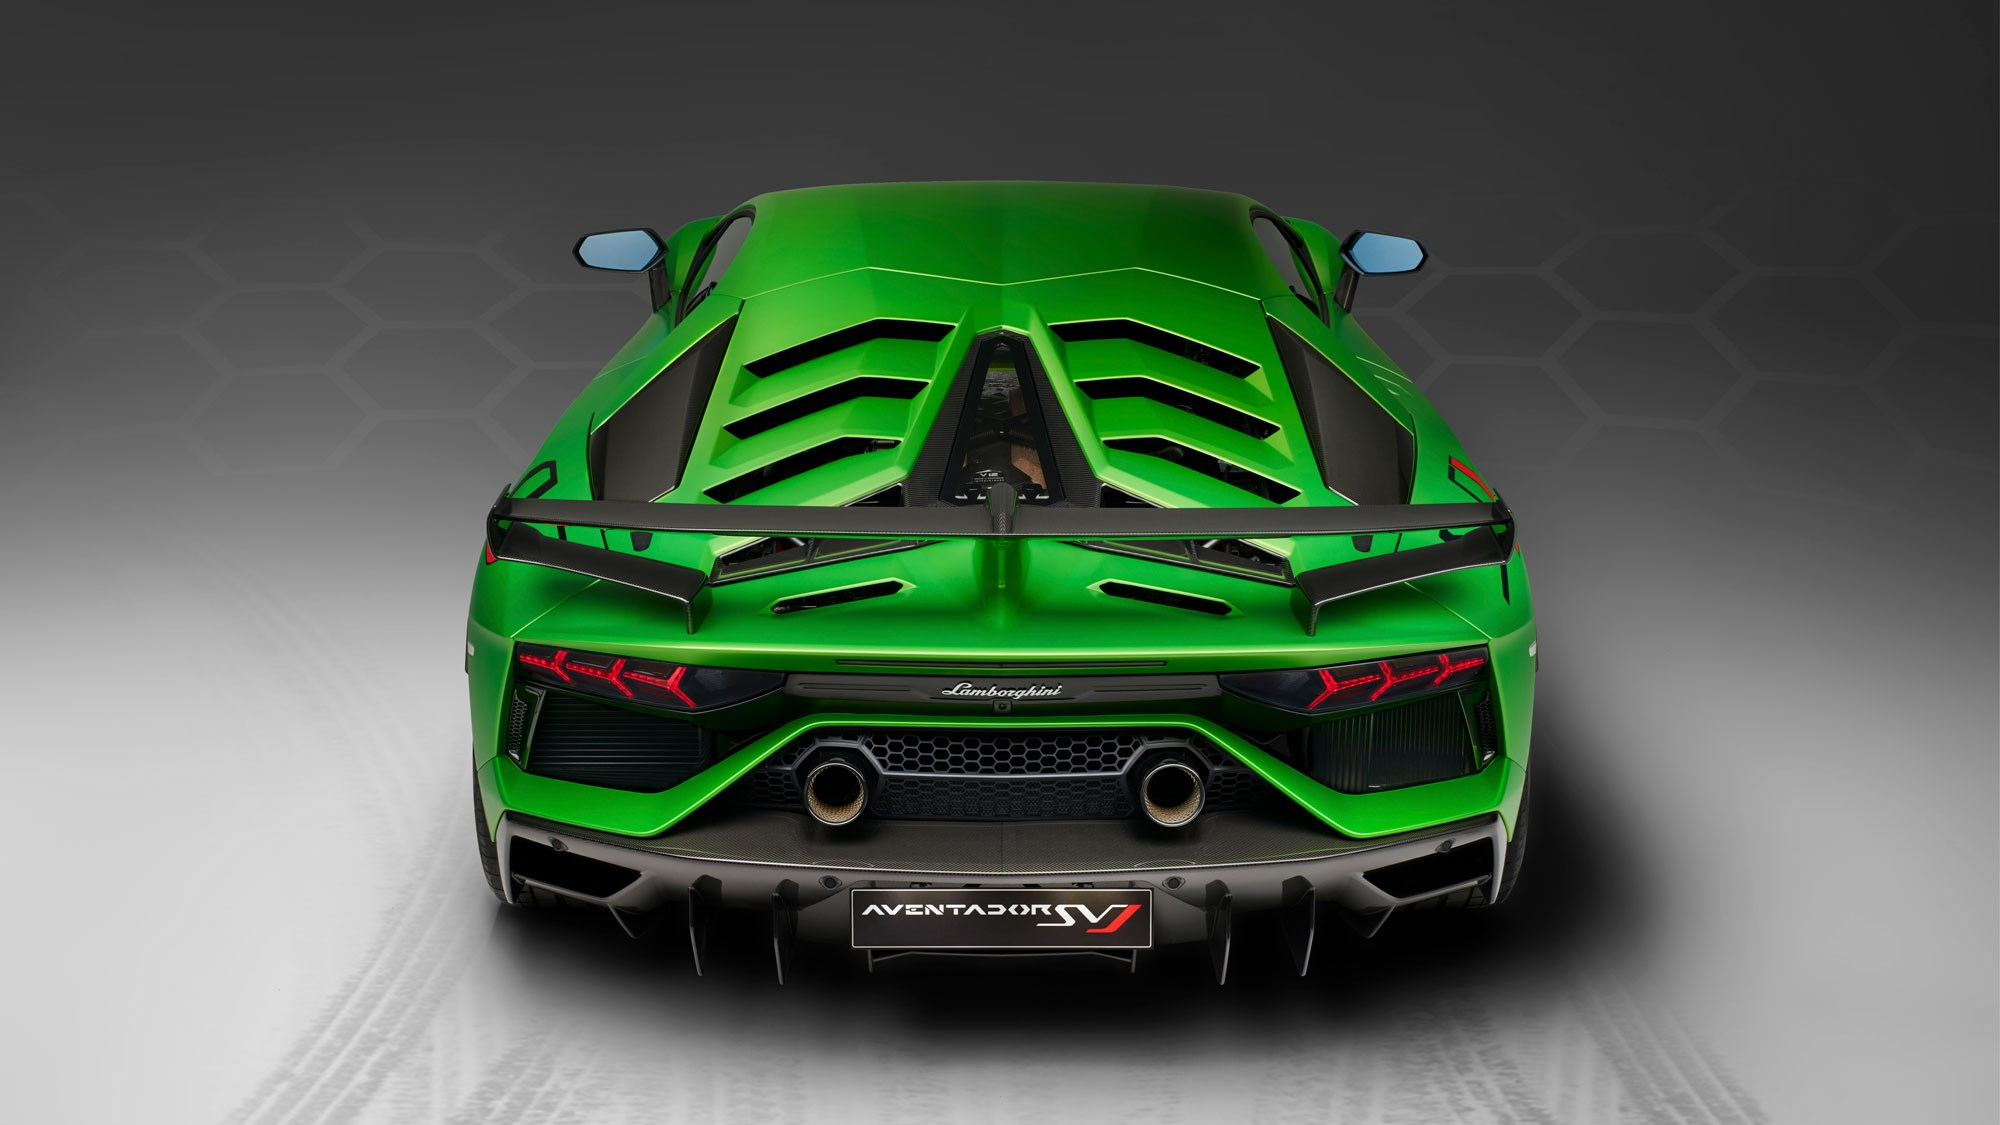 Lamborghini Aventador SVJ: 759bhp Flagship Unveiled At Pebble Beach | CAR  Magazine